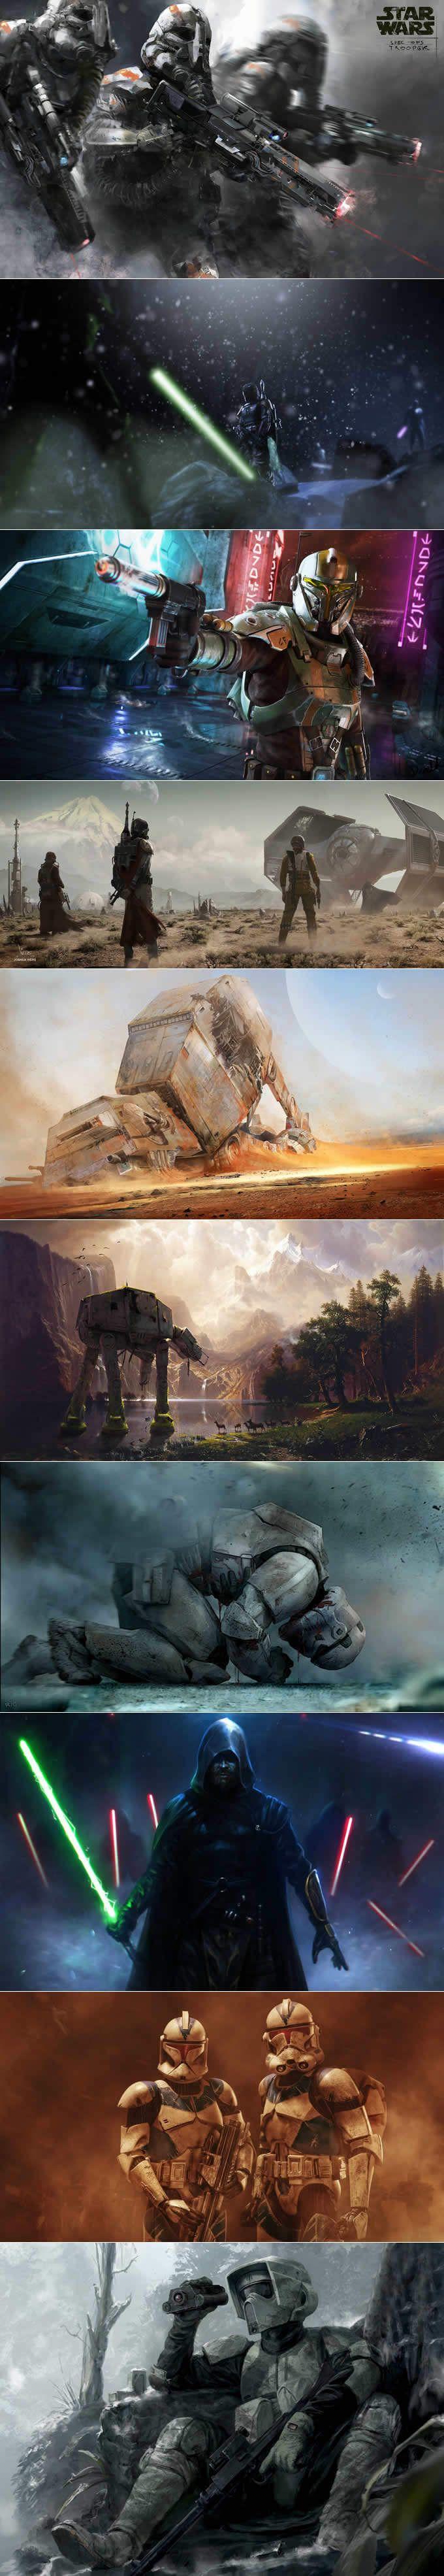 SomeStar Wars Wallpapers